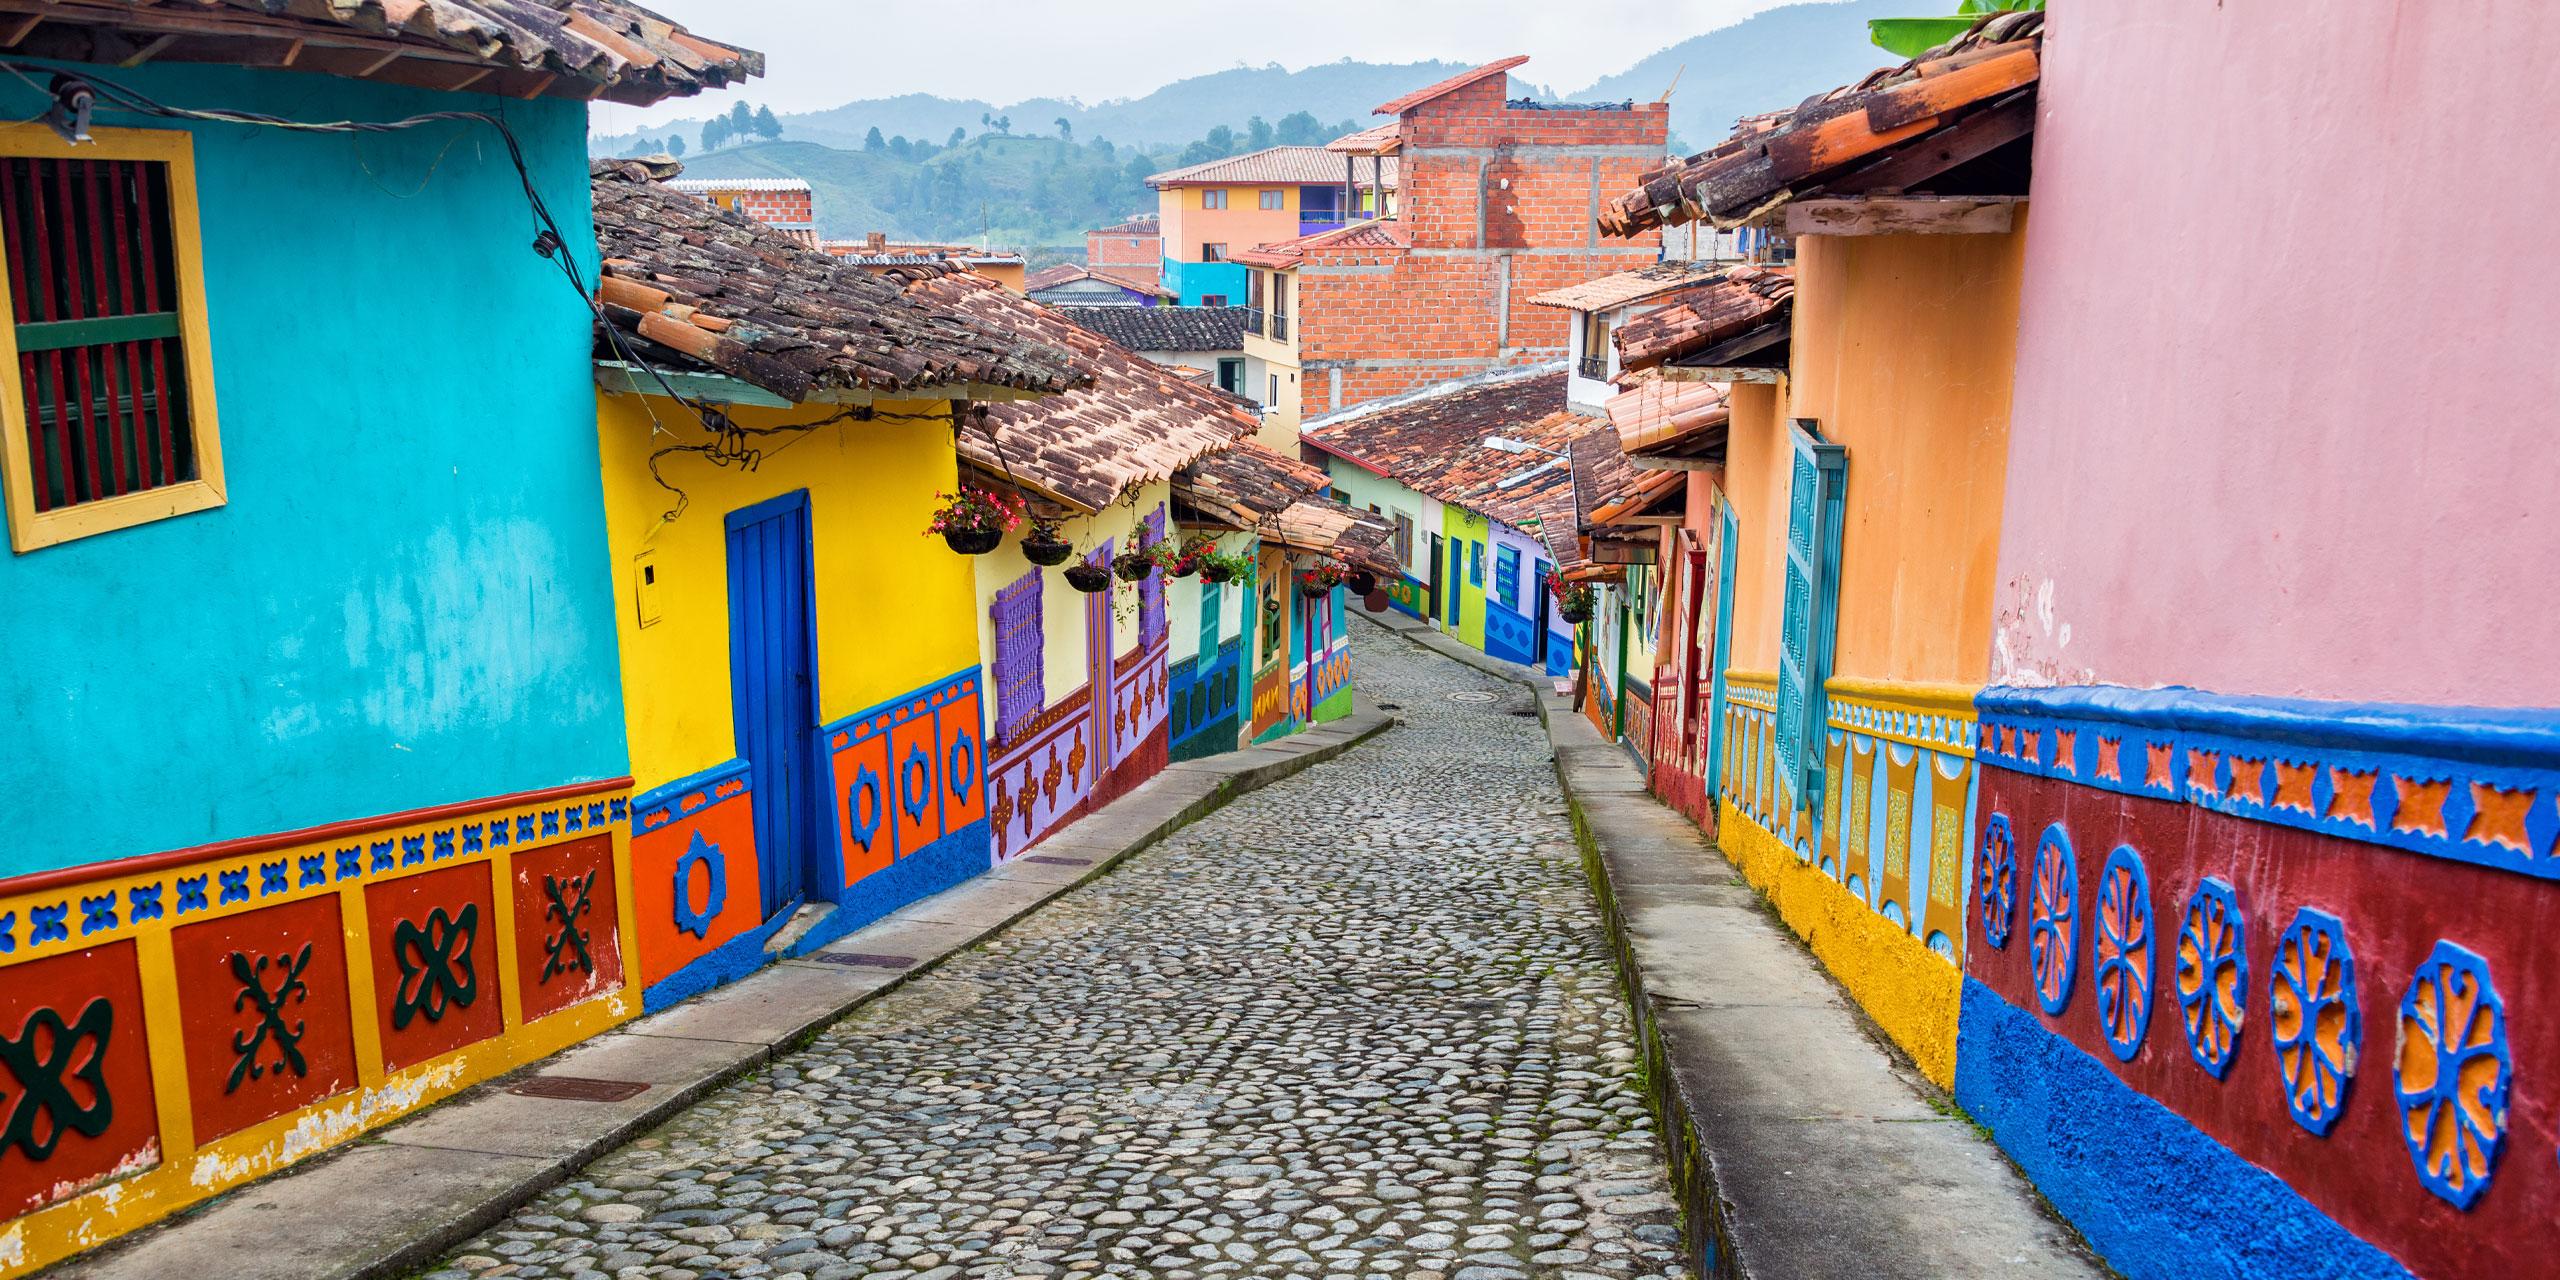 Colombia; Courtesy of Jess Kraft/Shutterstock.com